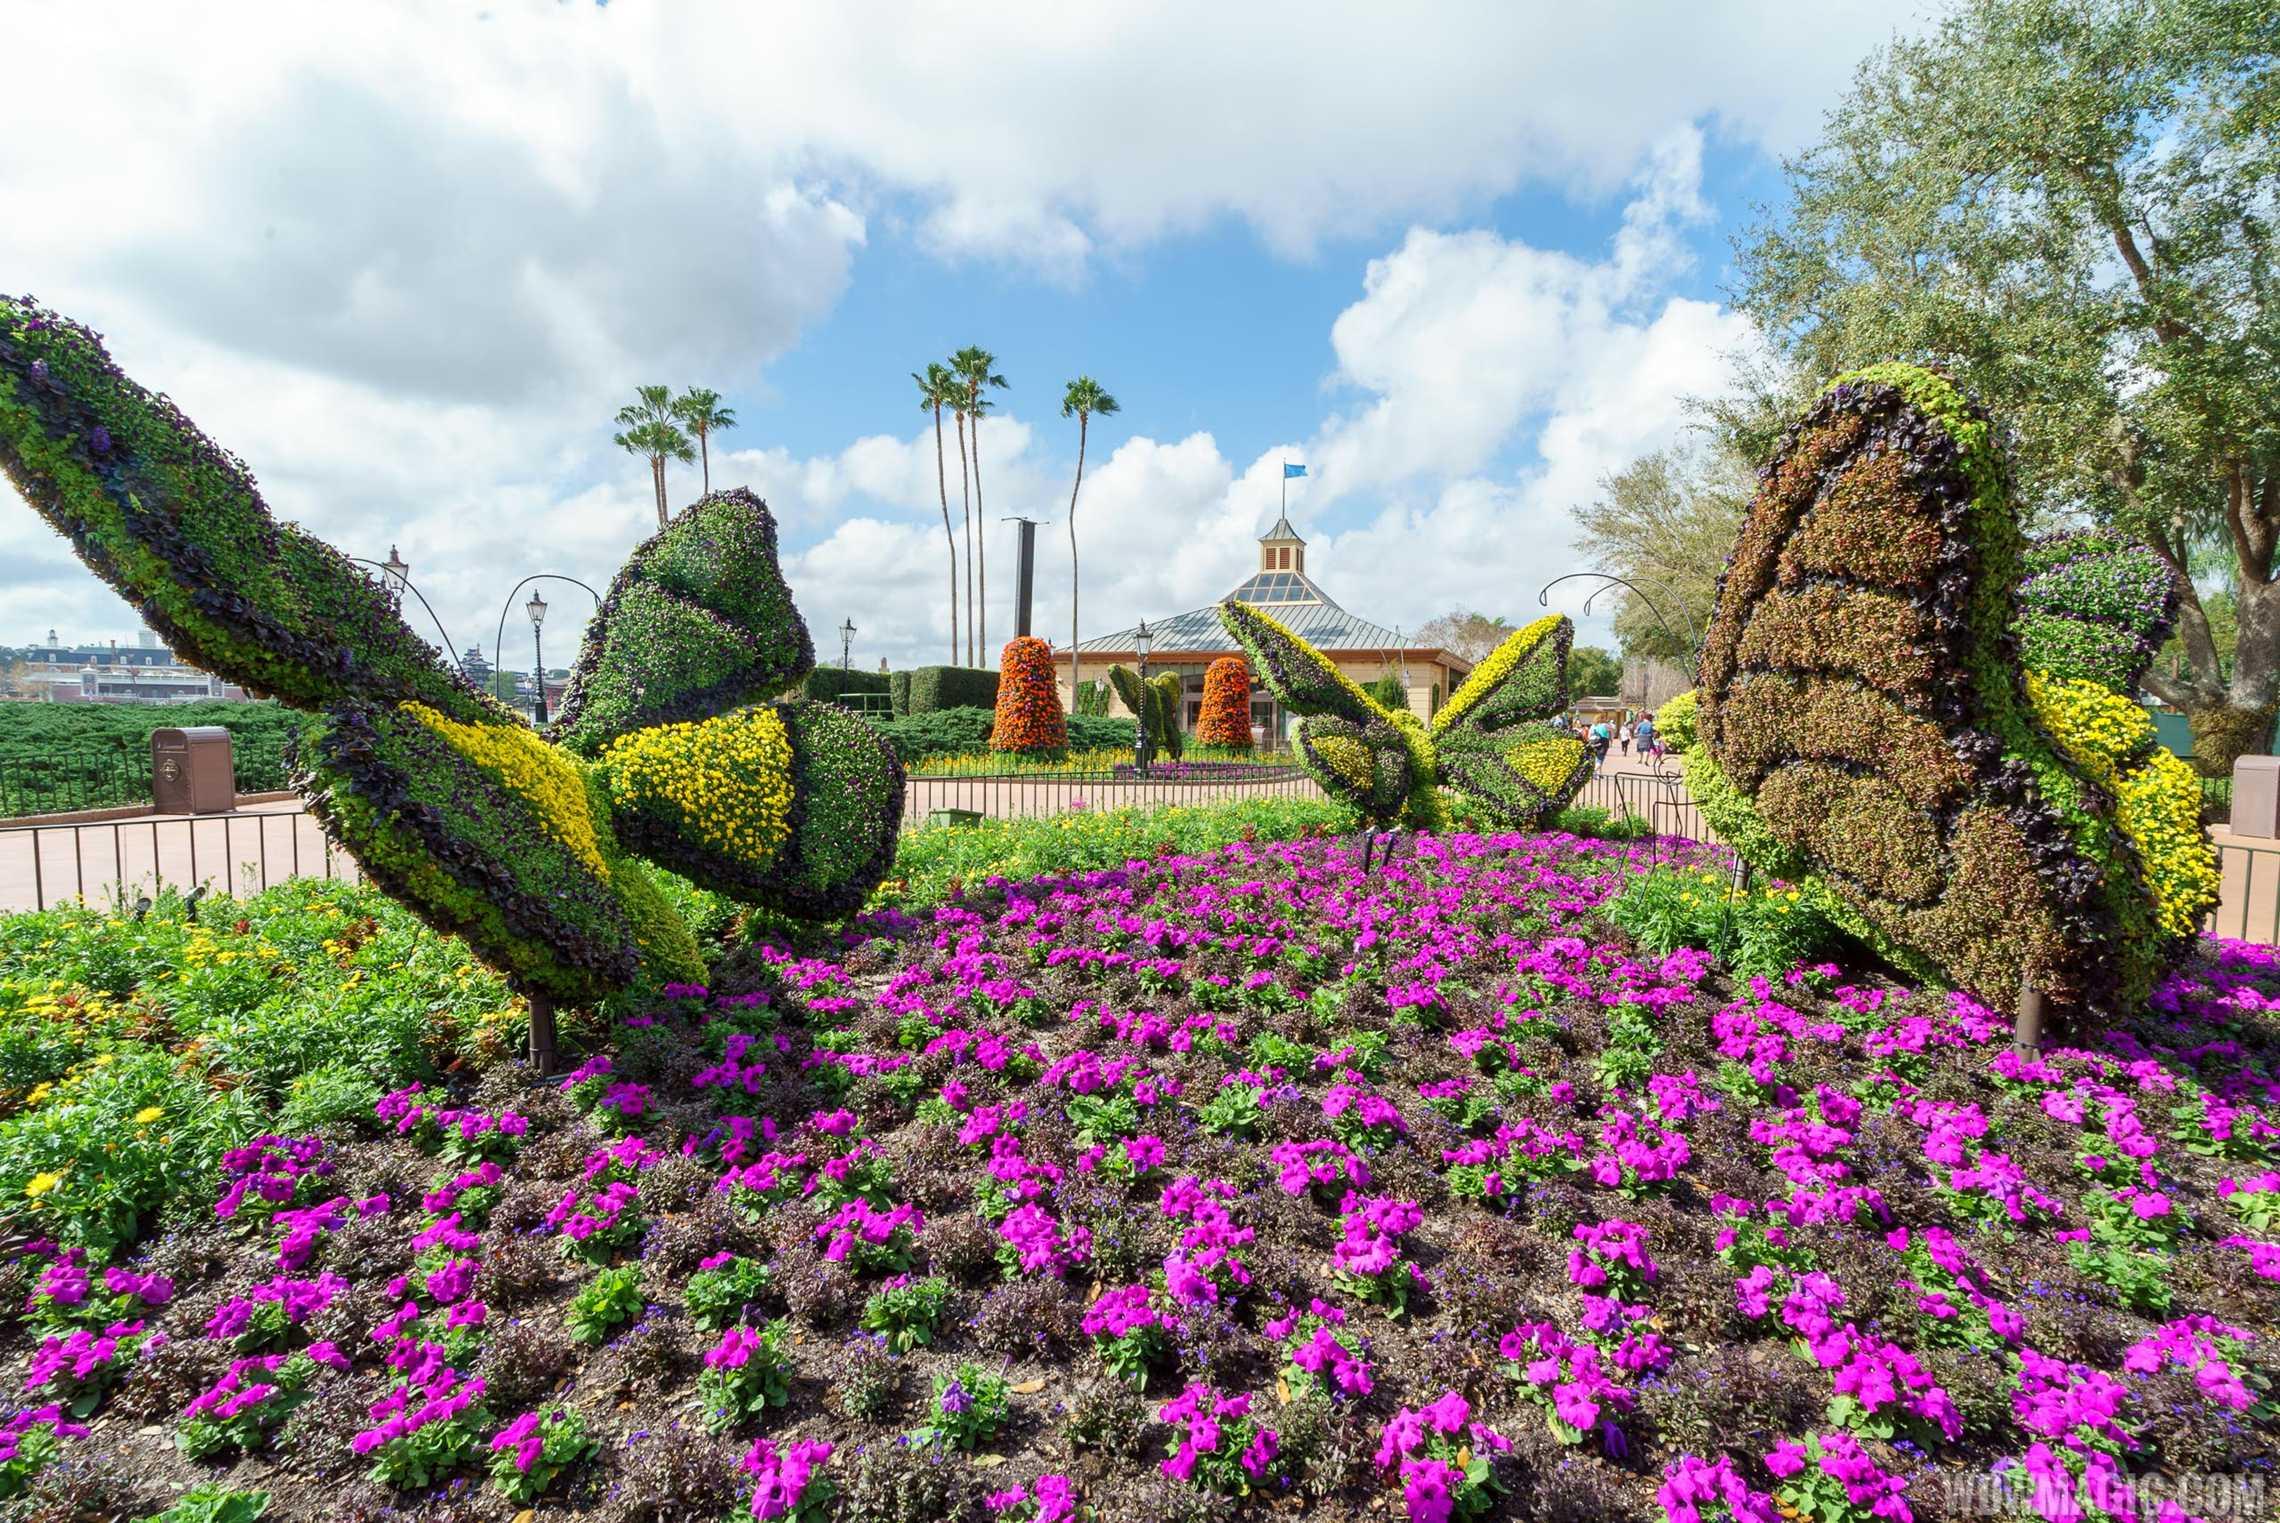 2017 Flower and Garden Festival - Butterflies topiaries in Showcase Plaza